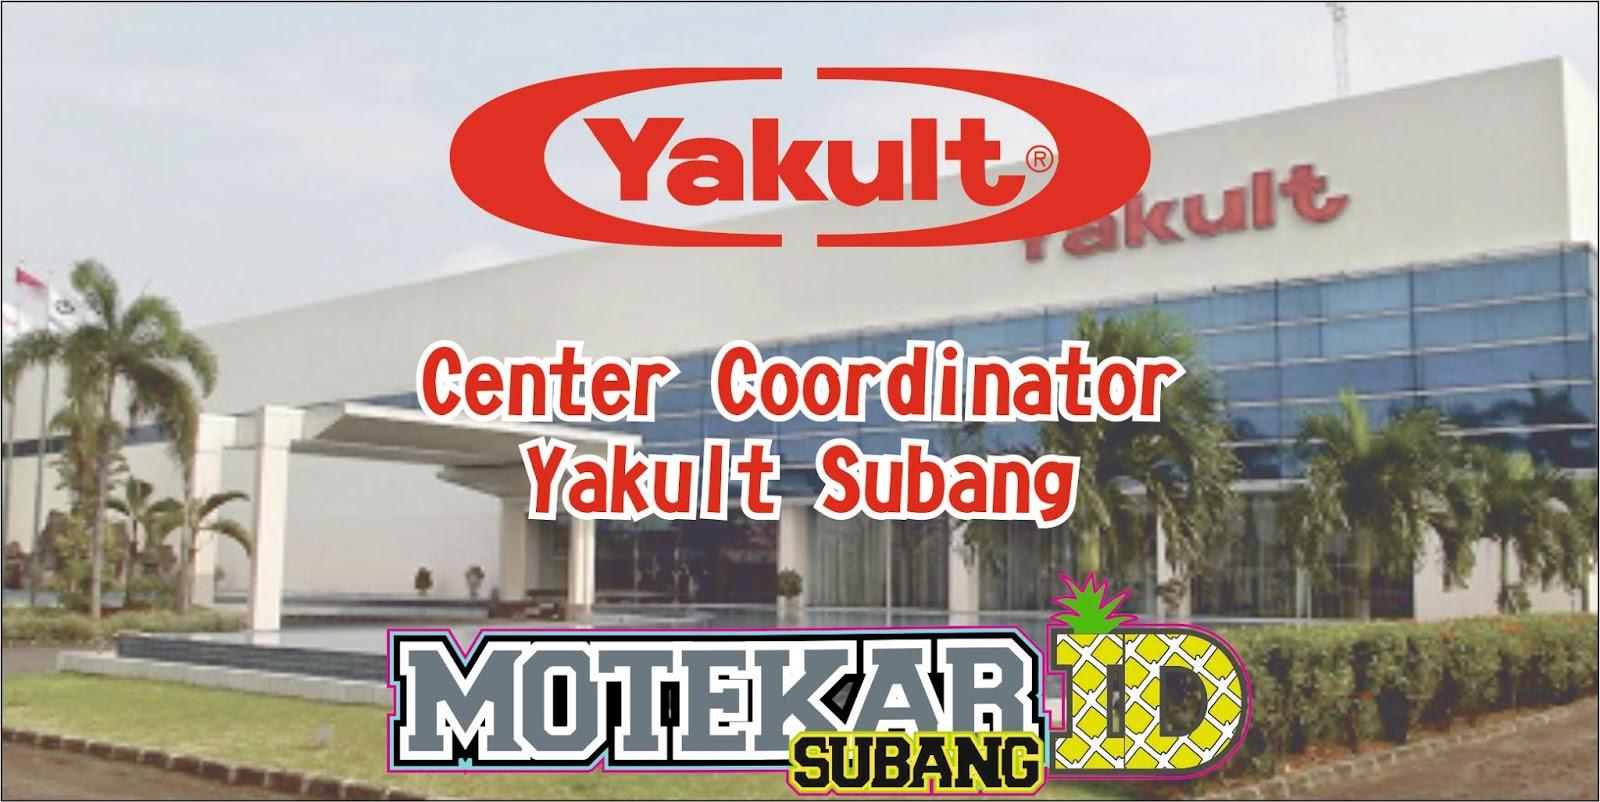 Info Loker Center Coordinator Yakult Subang 2019 Motekar Subang